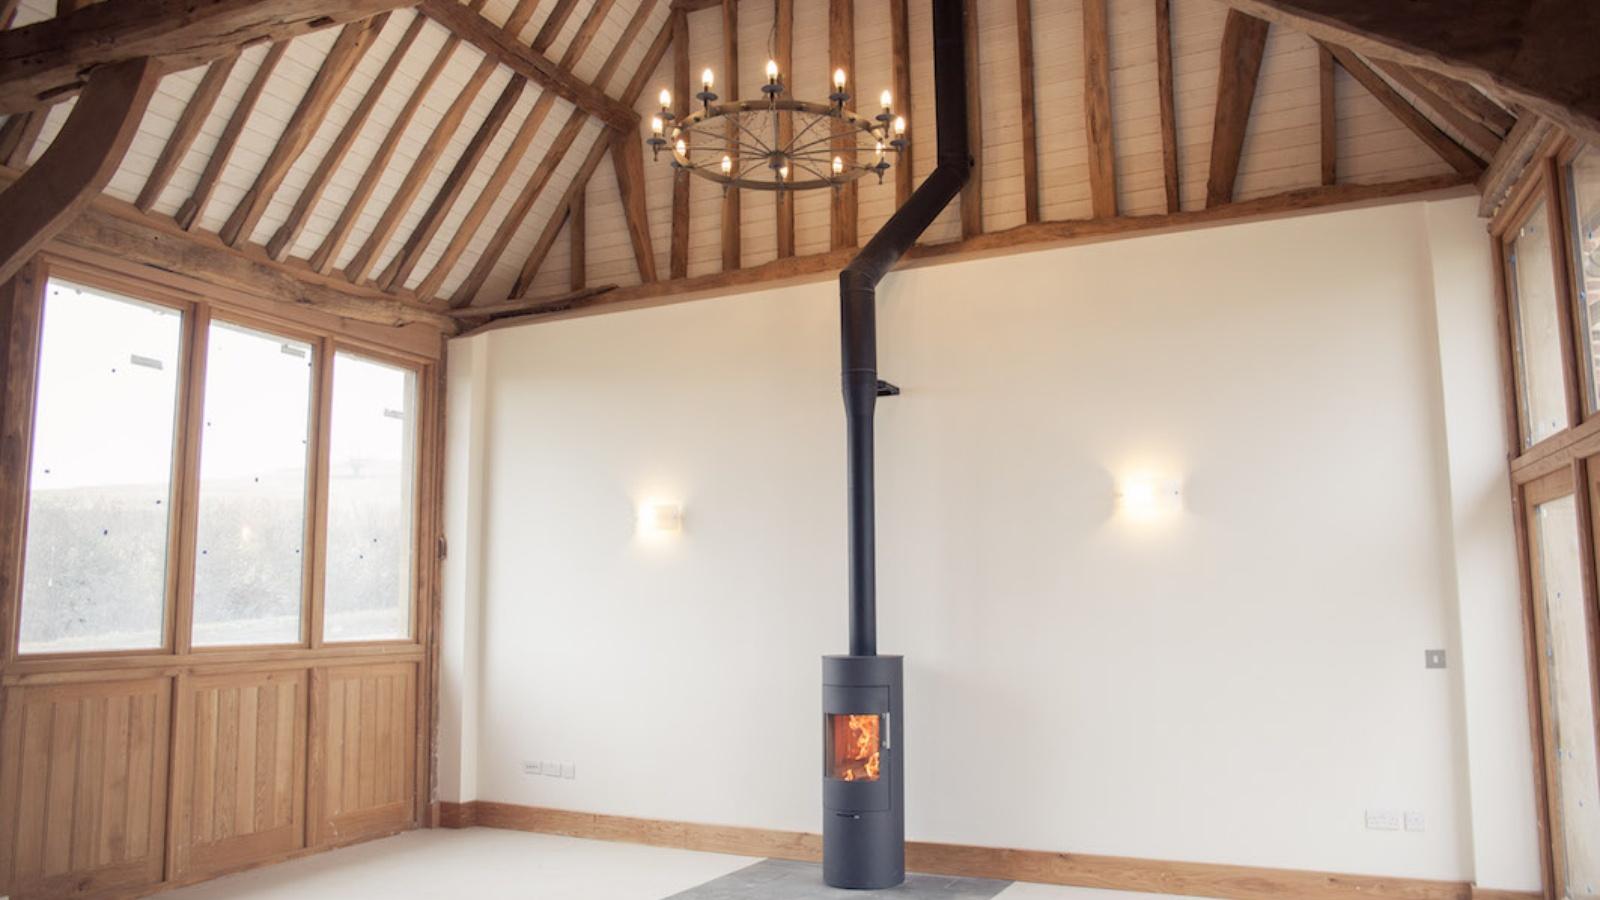 Rais Viva 120 'Classic' to a listed barn conversion in Quainton, Buckinghamshire.